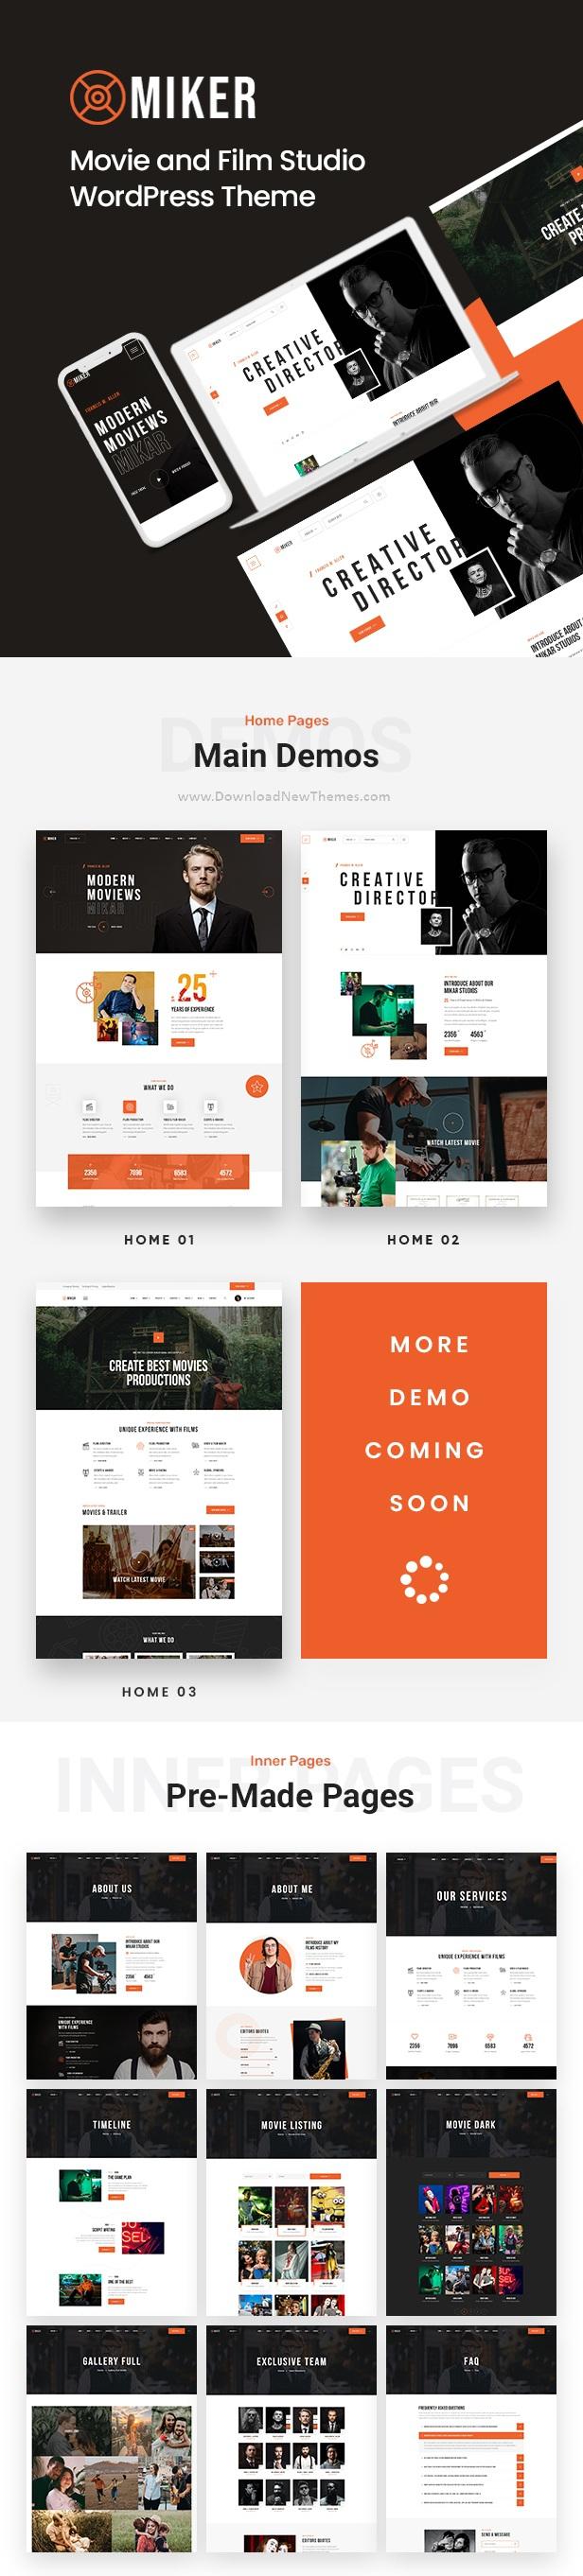 Movie and Film Studio WordPress Theme